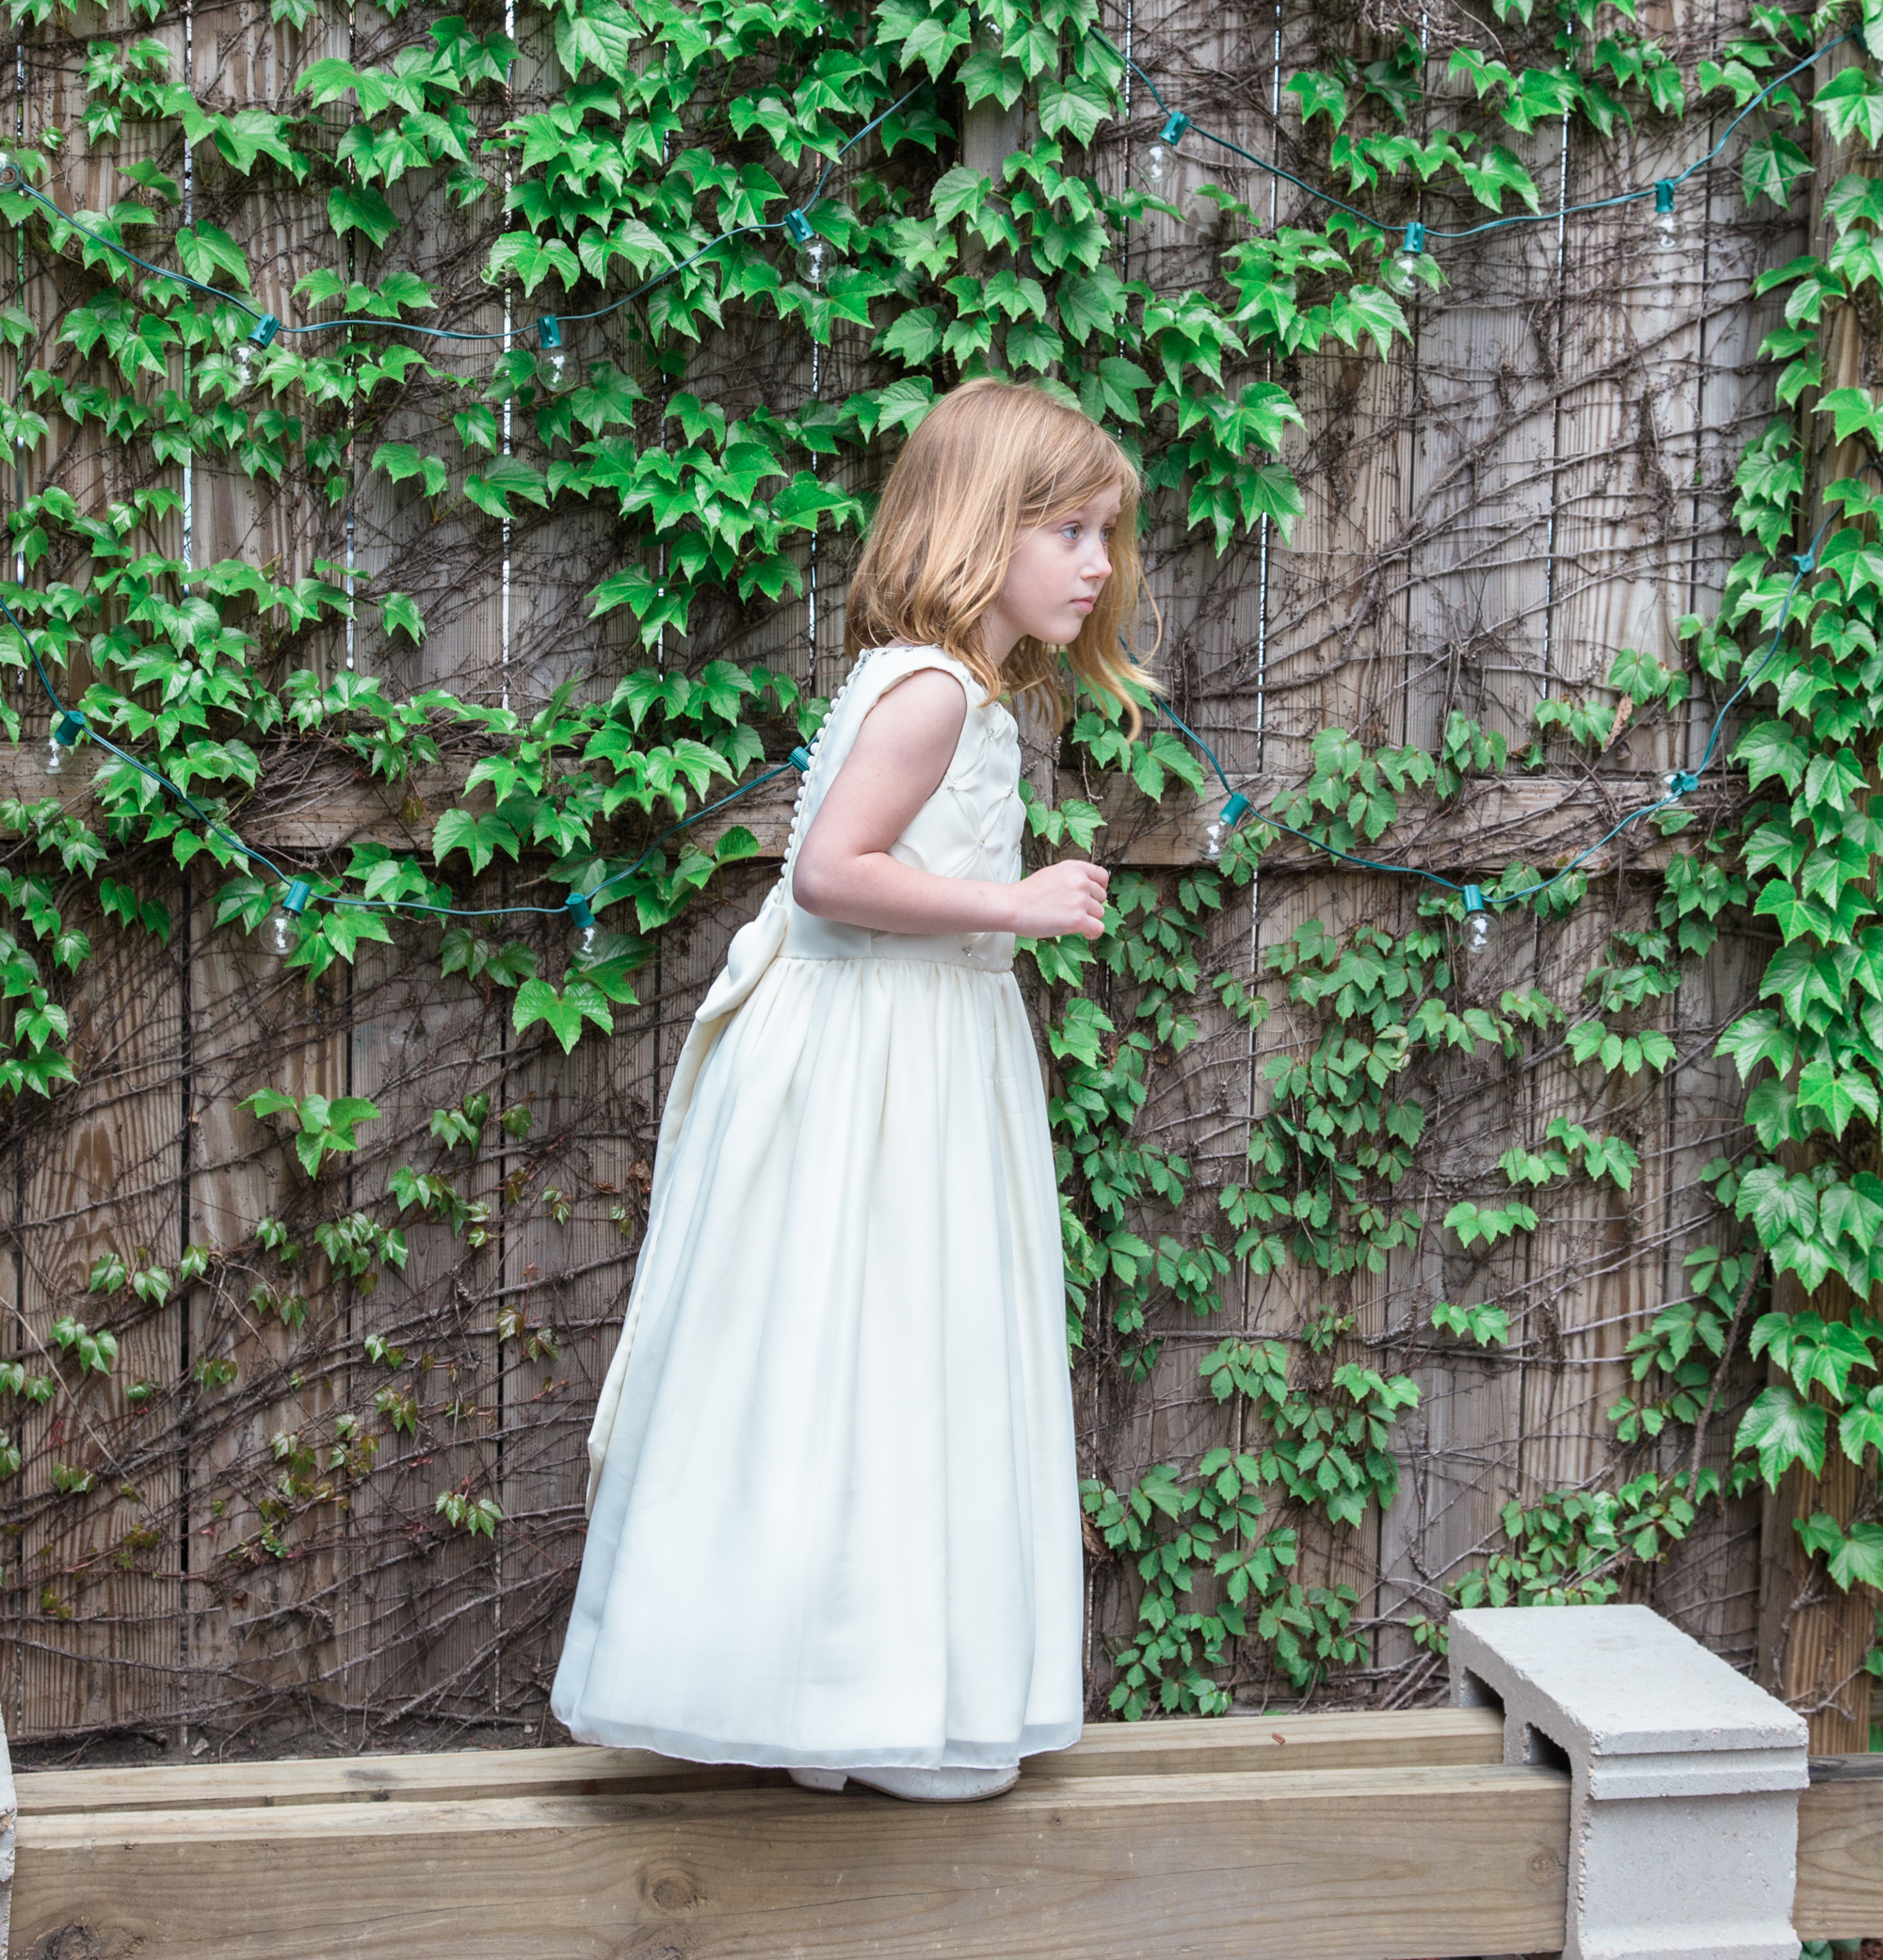 www.bonphotage.com Bonphotage Family Photography